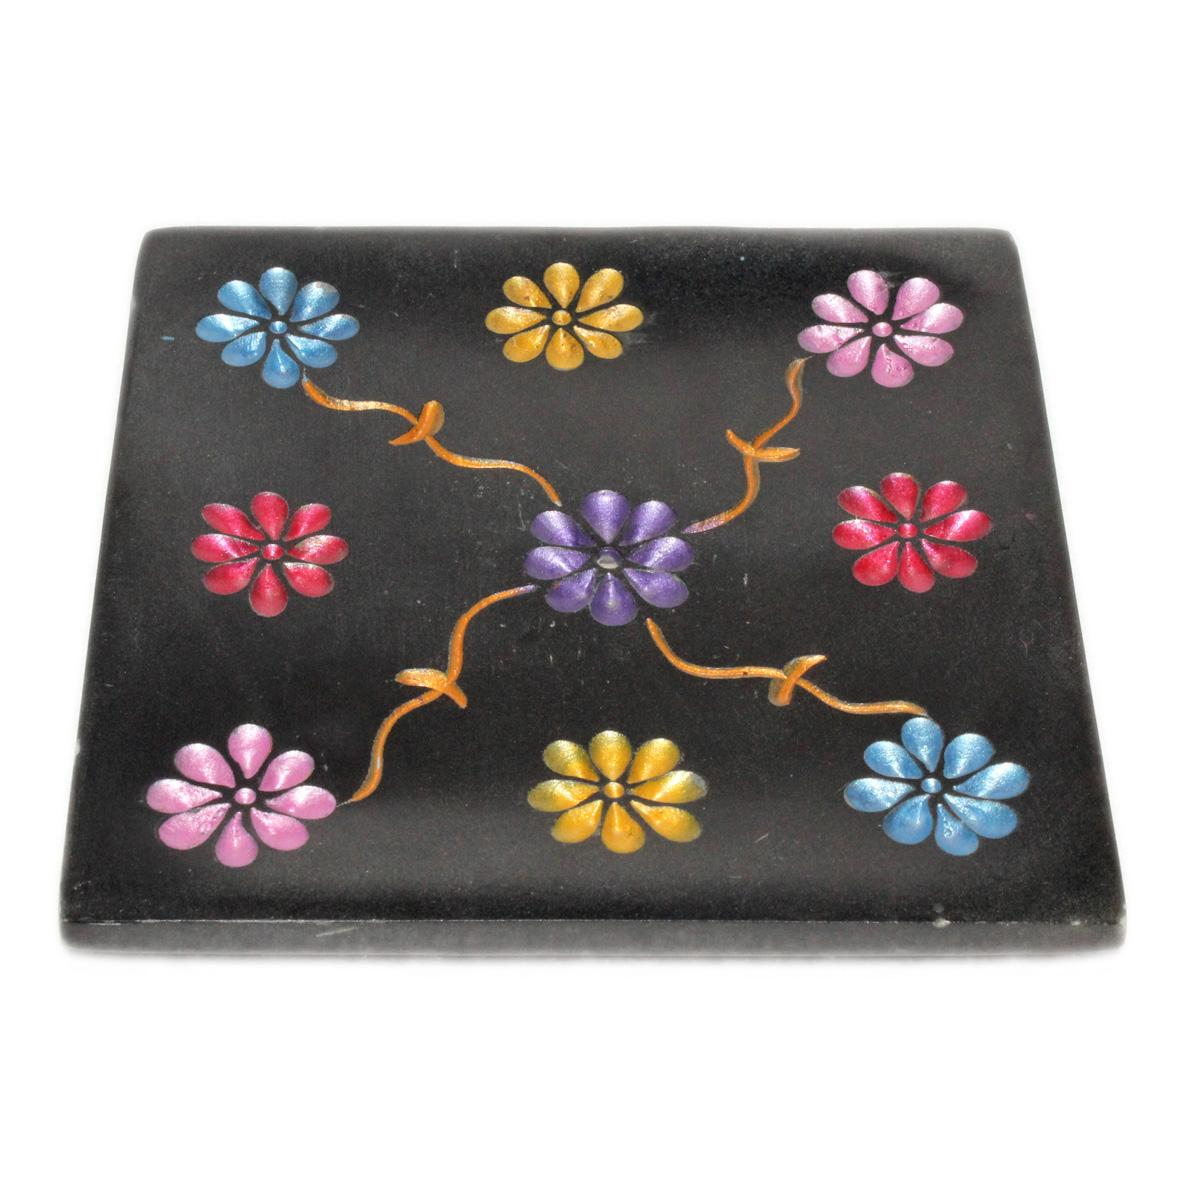 Sstone 10cm square  black